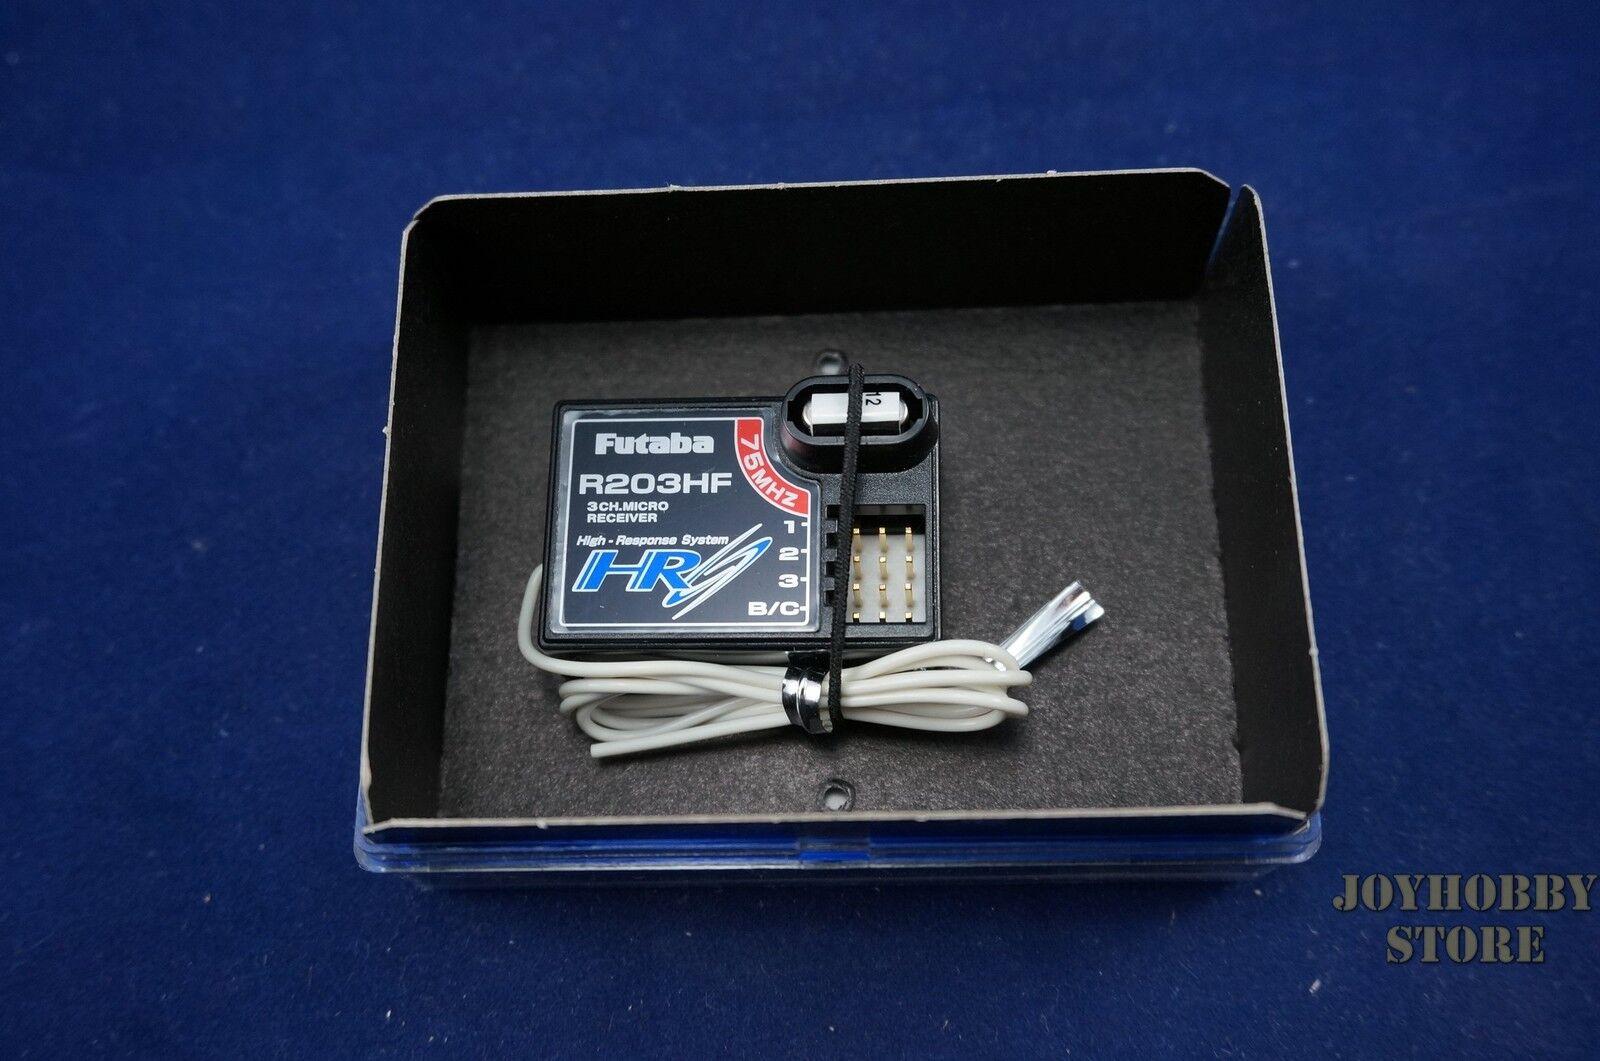 Futaba R203HF FM75 3 Channel High Response System Micro Receiver